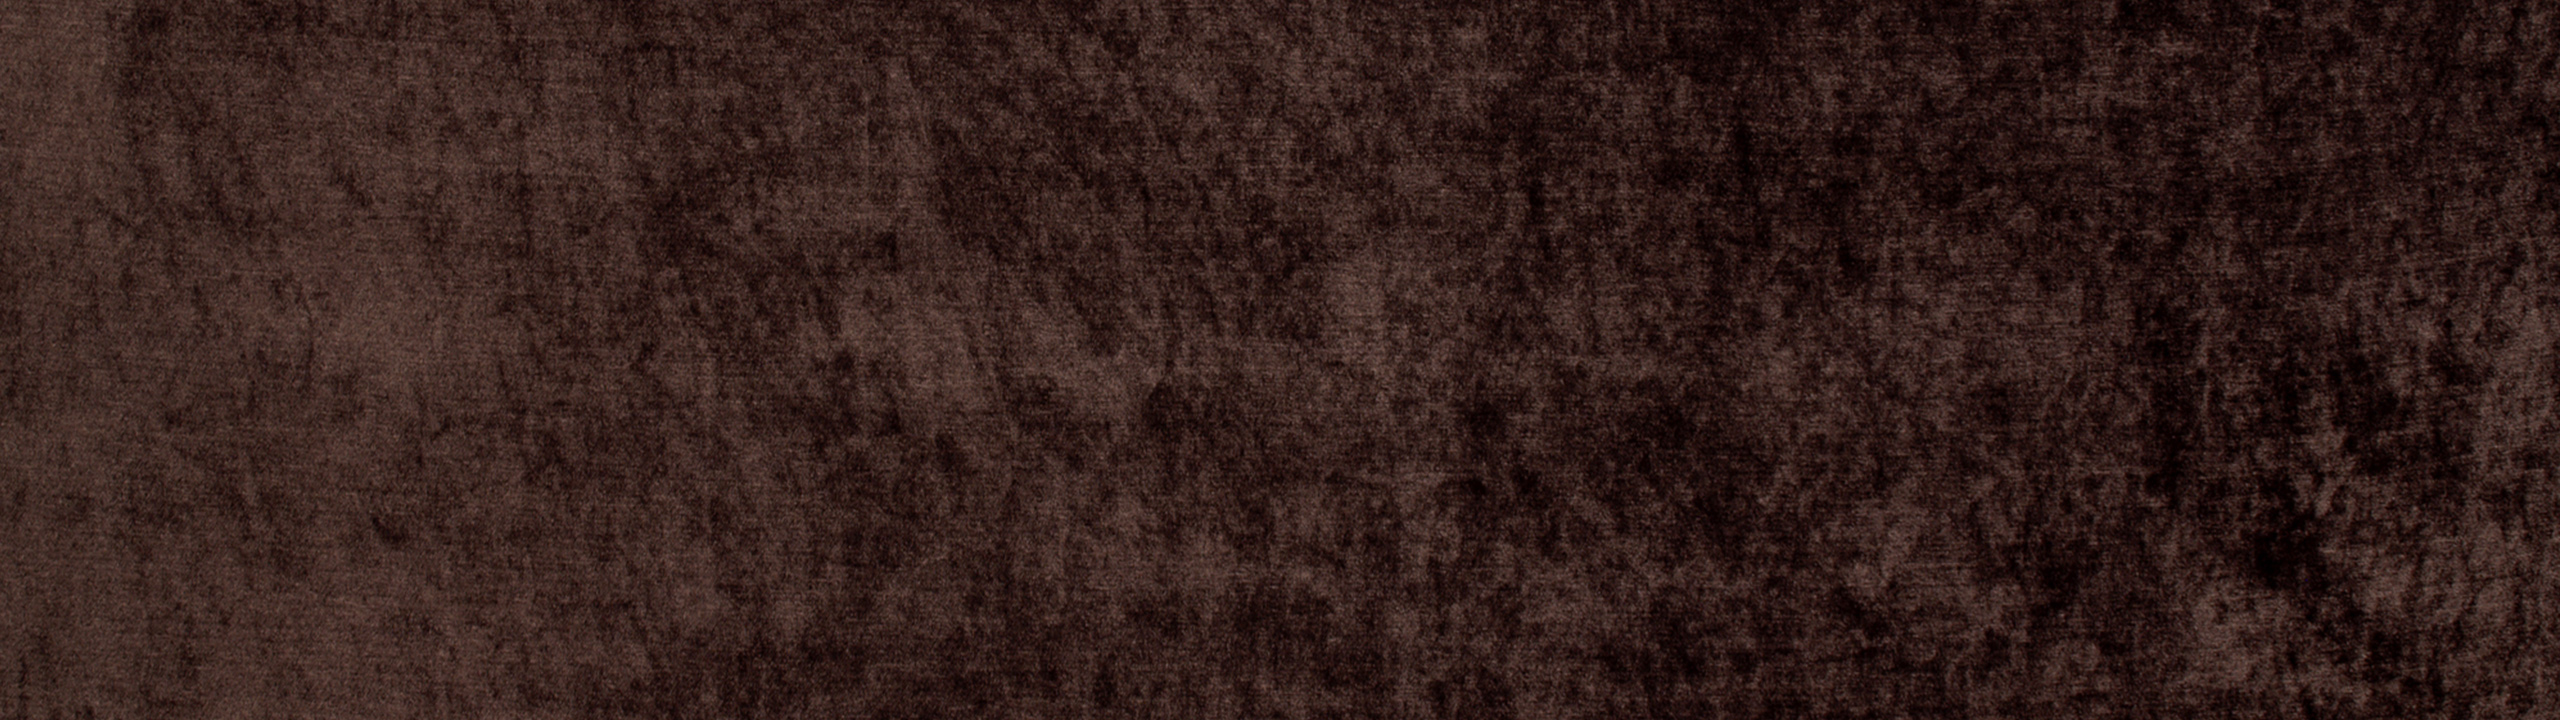 Izmir-488-02--